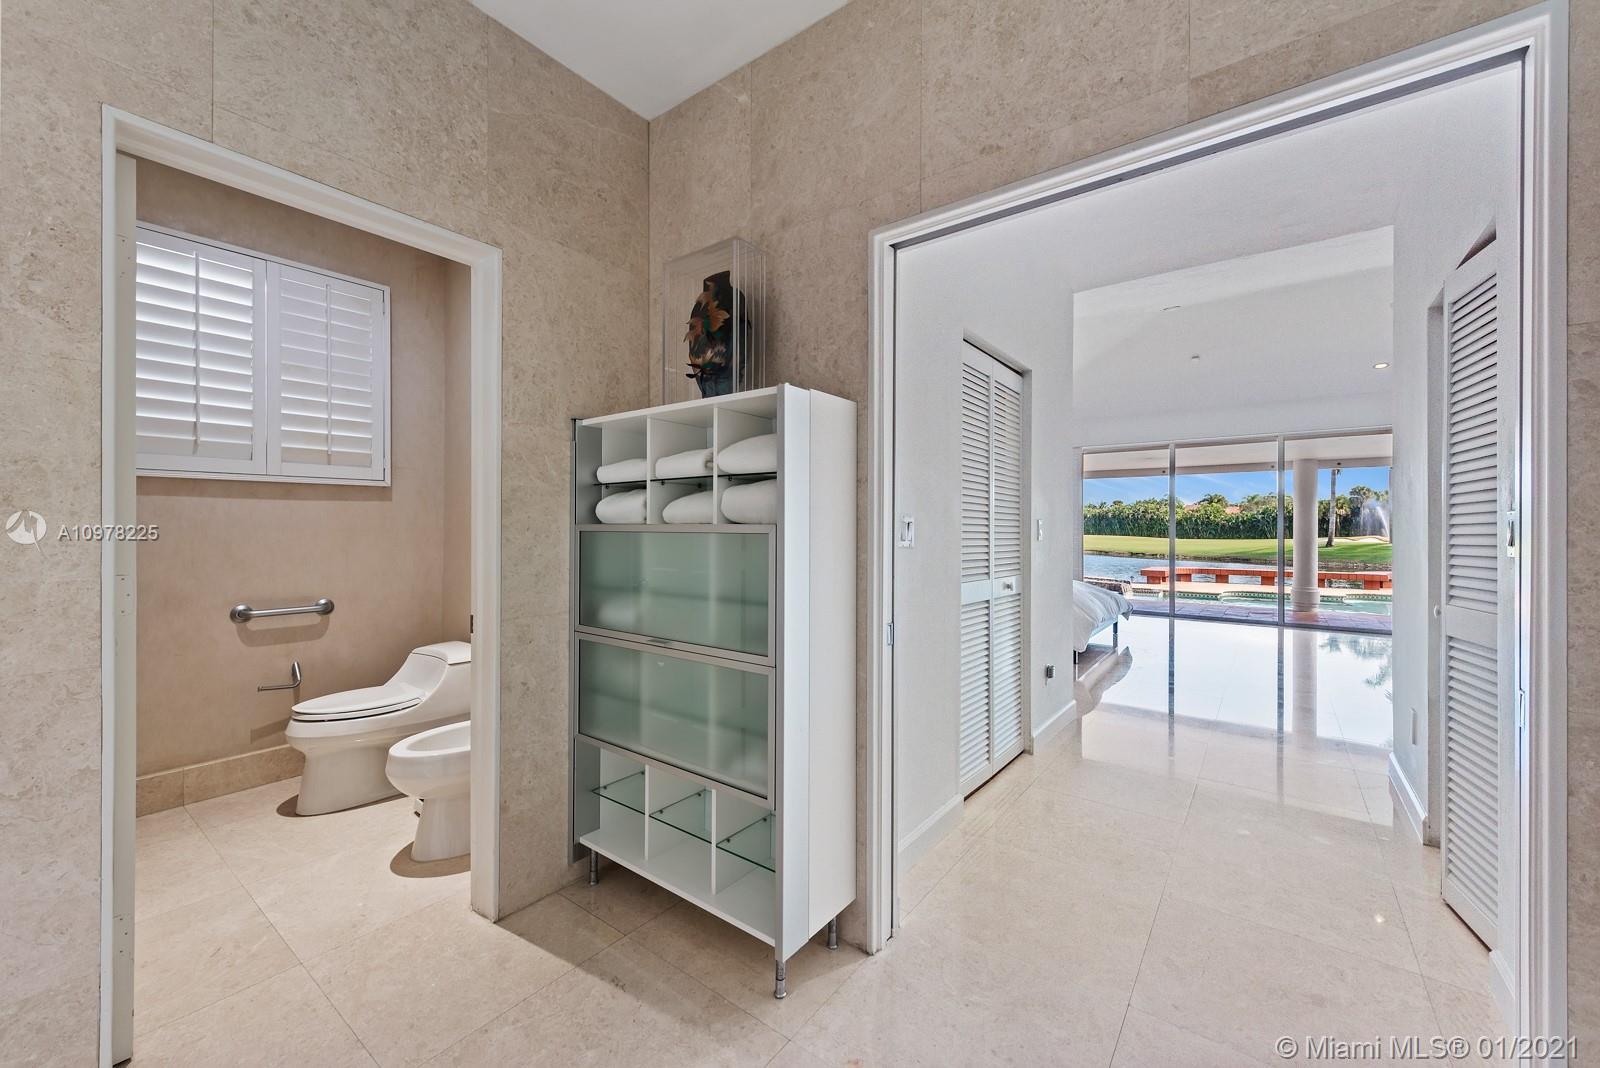 Master Bath Room Water Closet